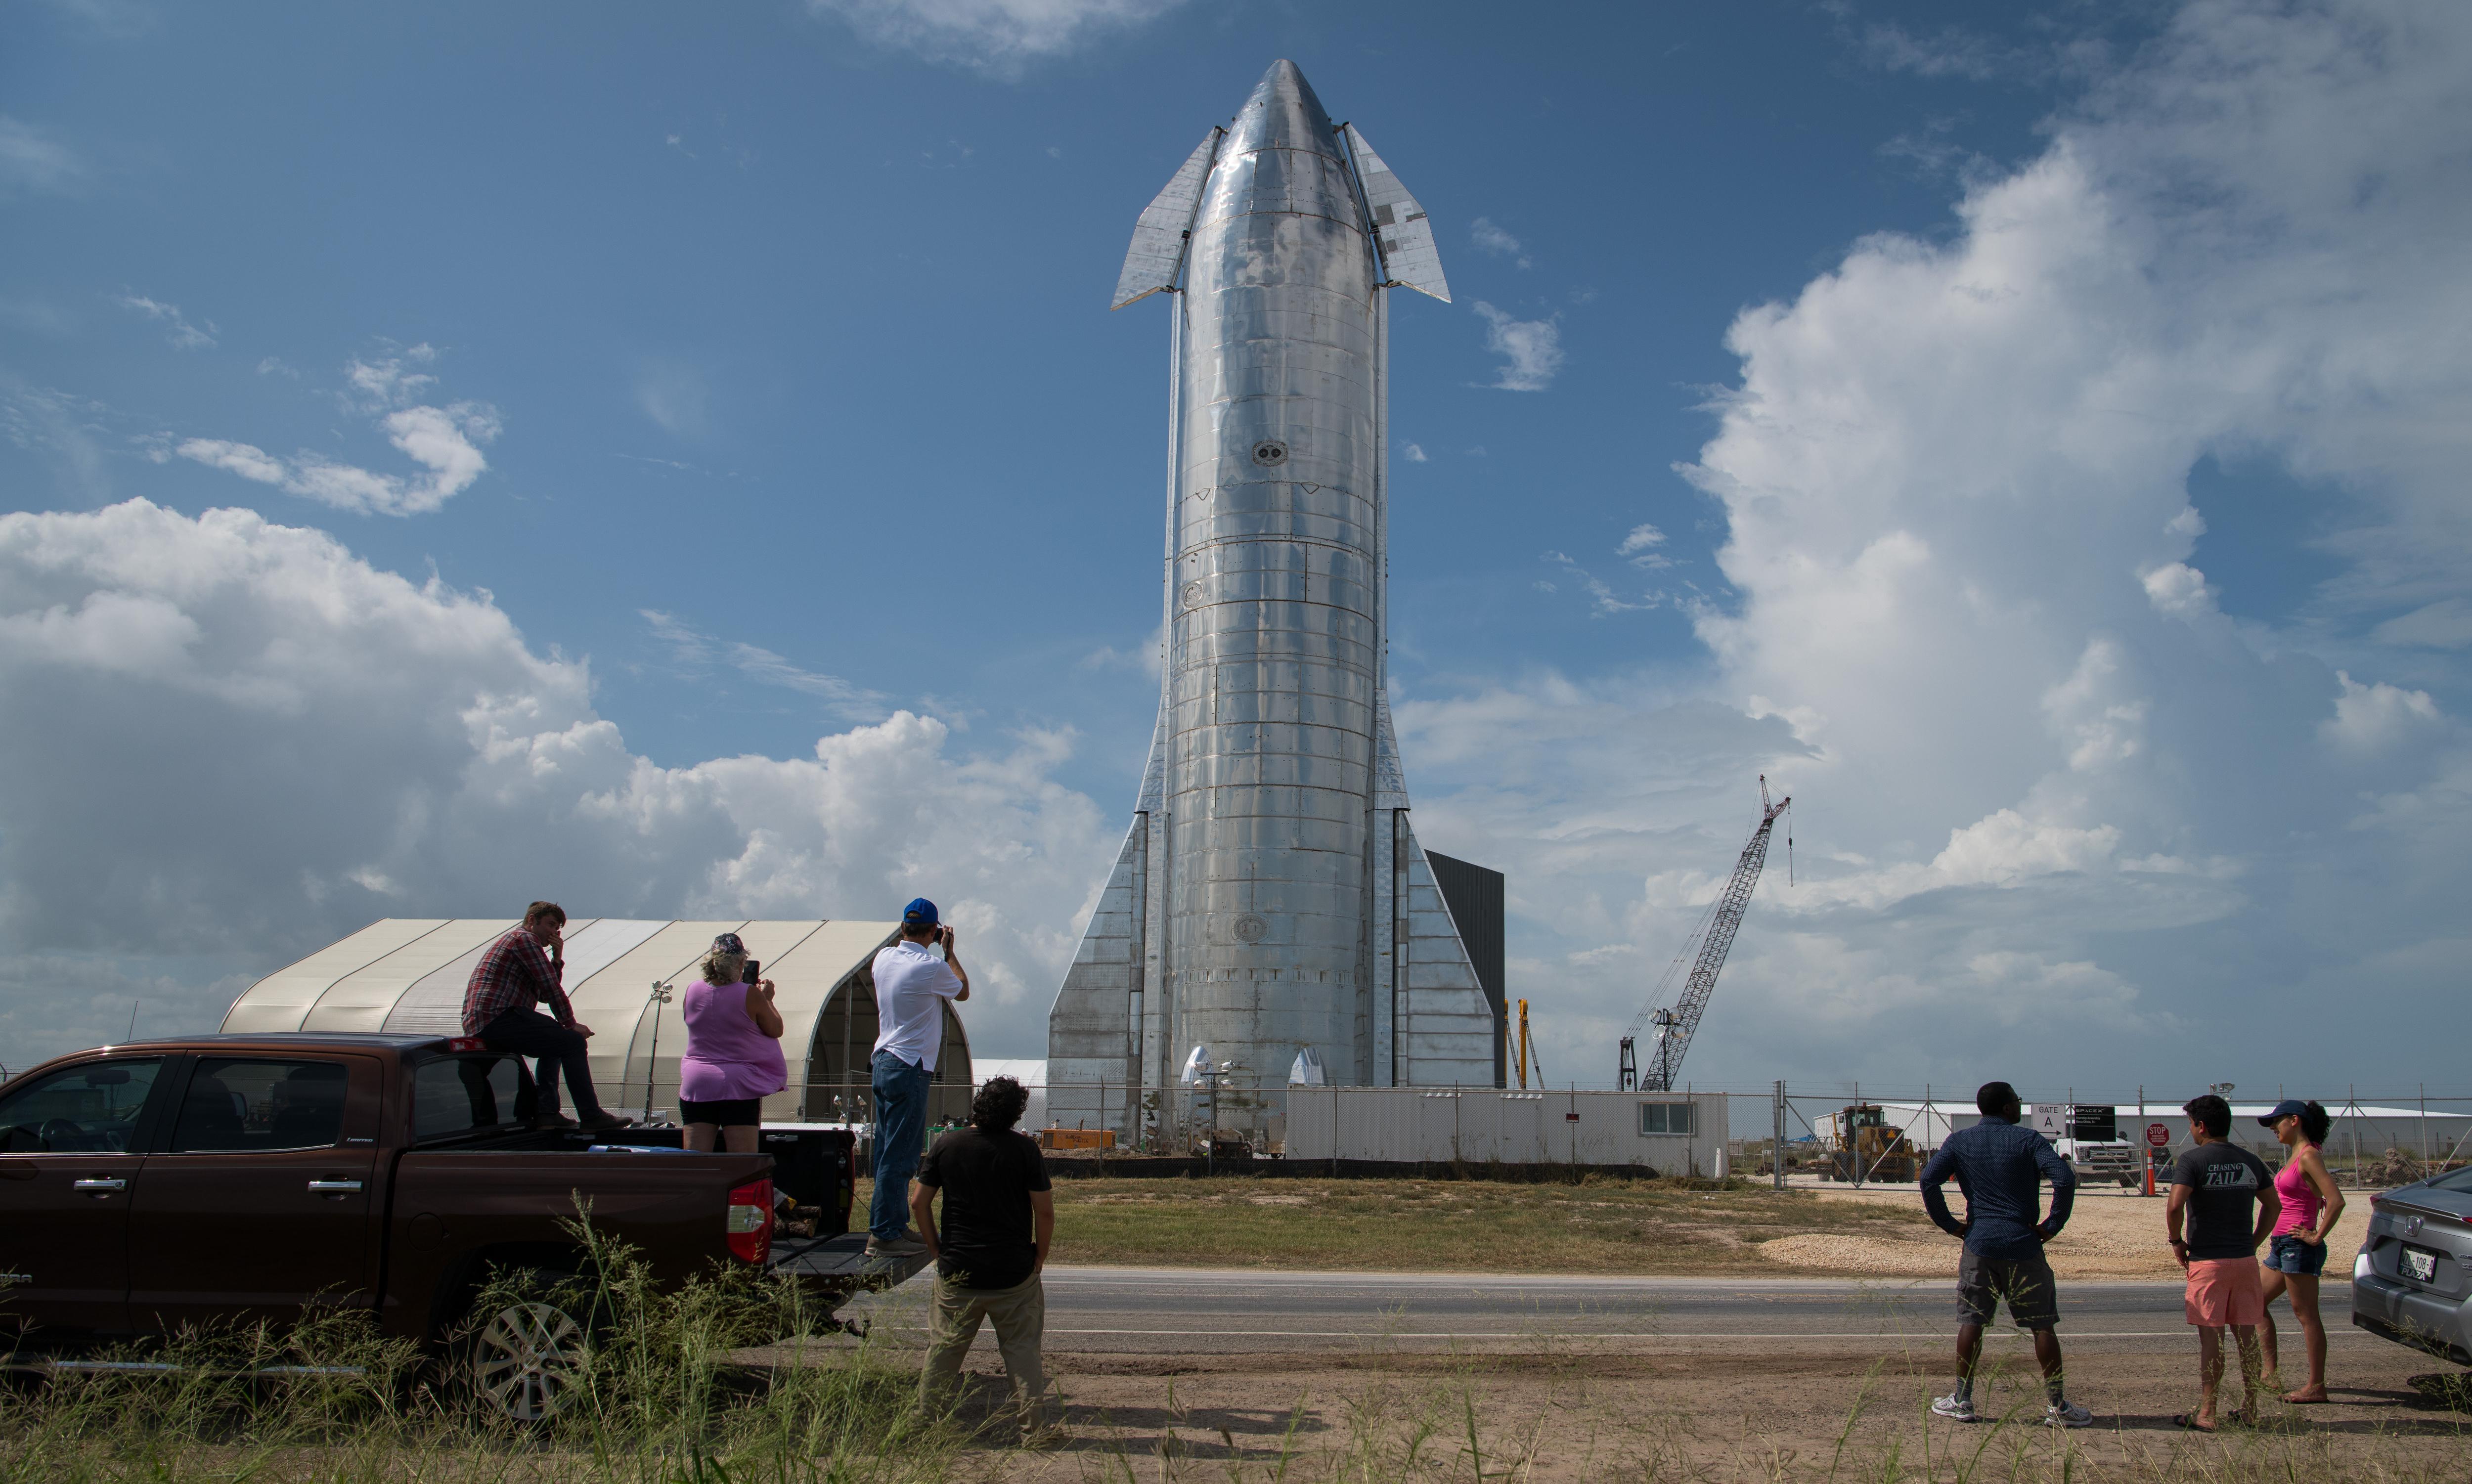 Elon Musk unveils Starship designed to take crew on round-trips to Mars